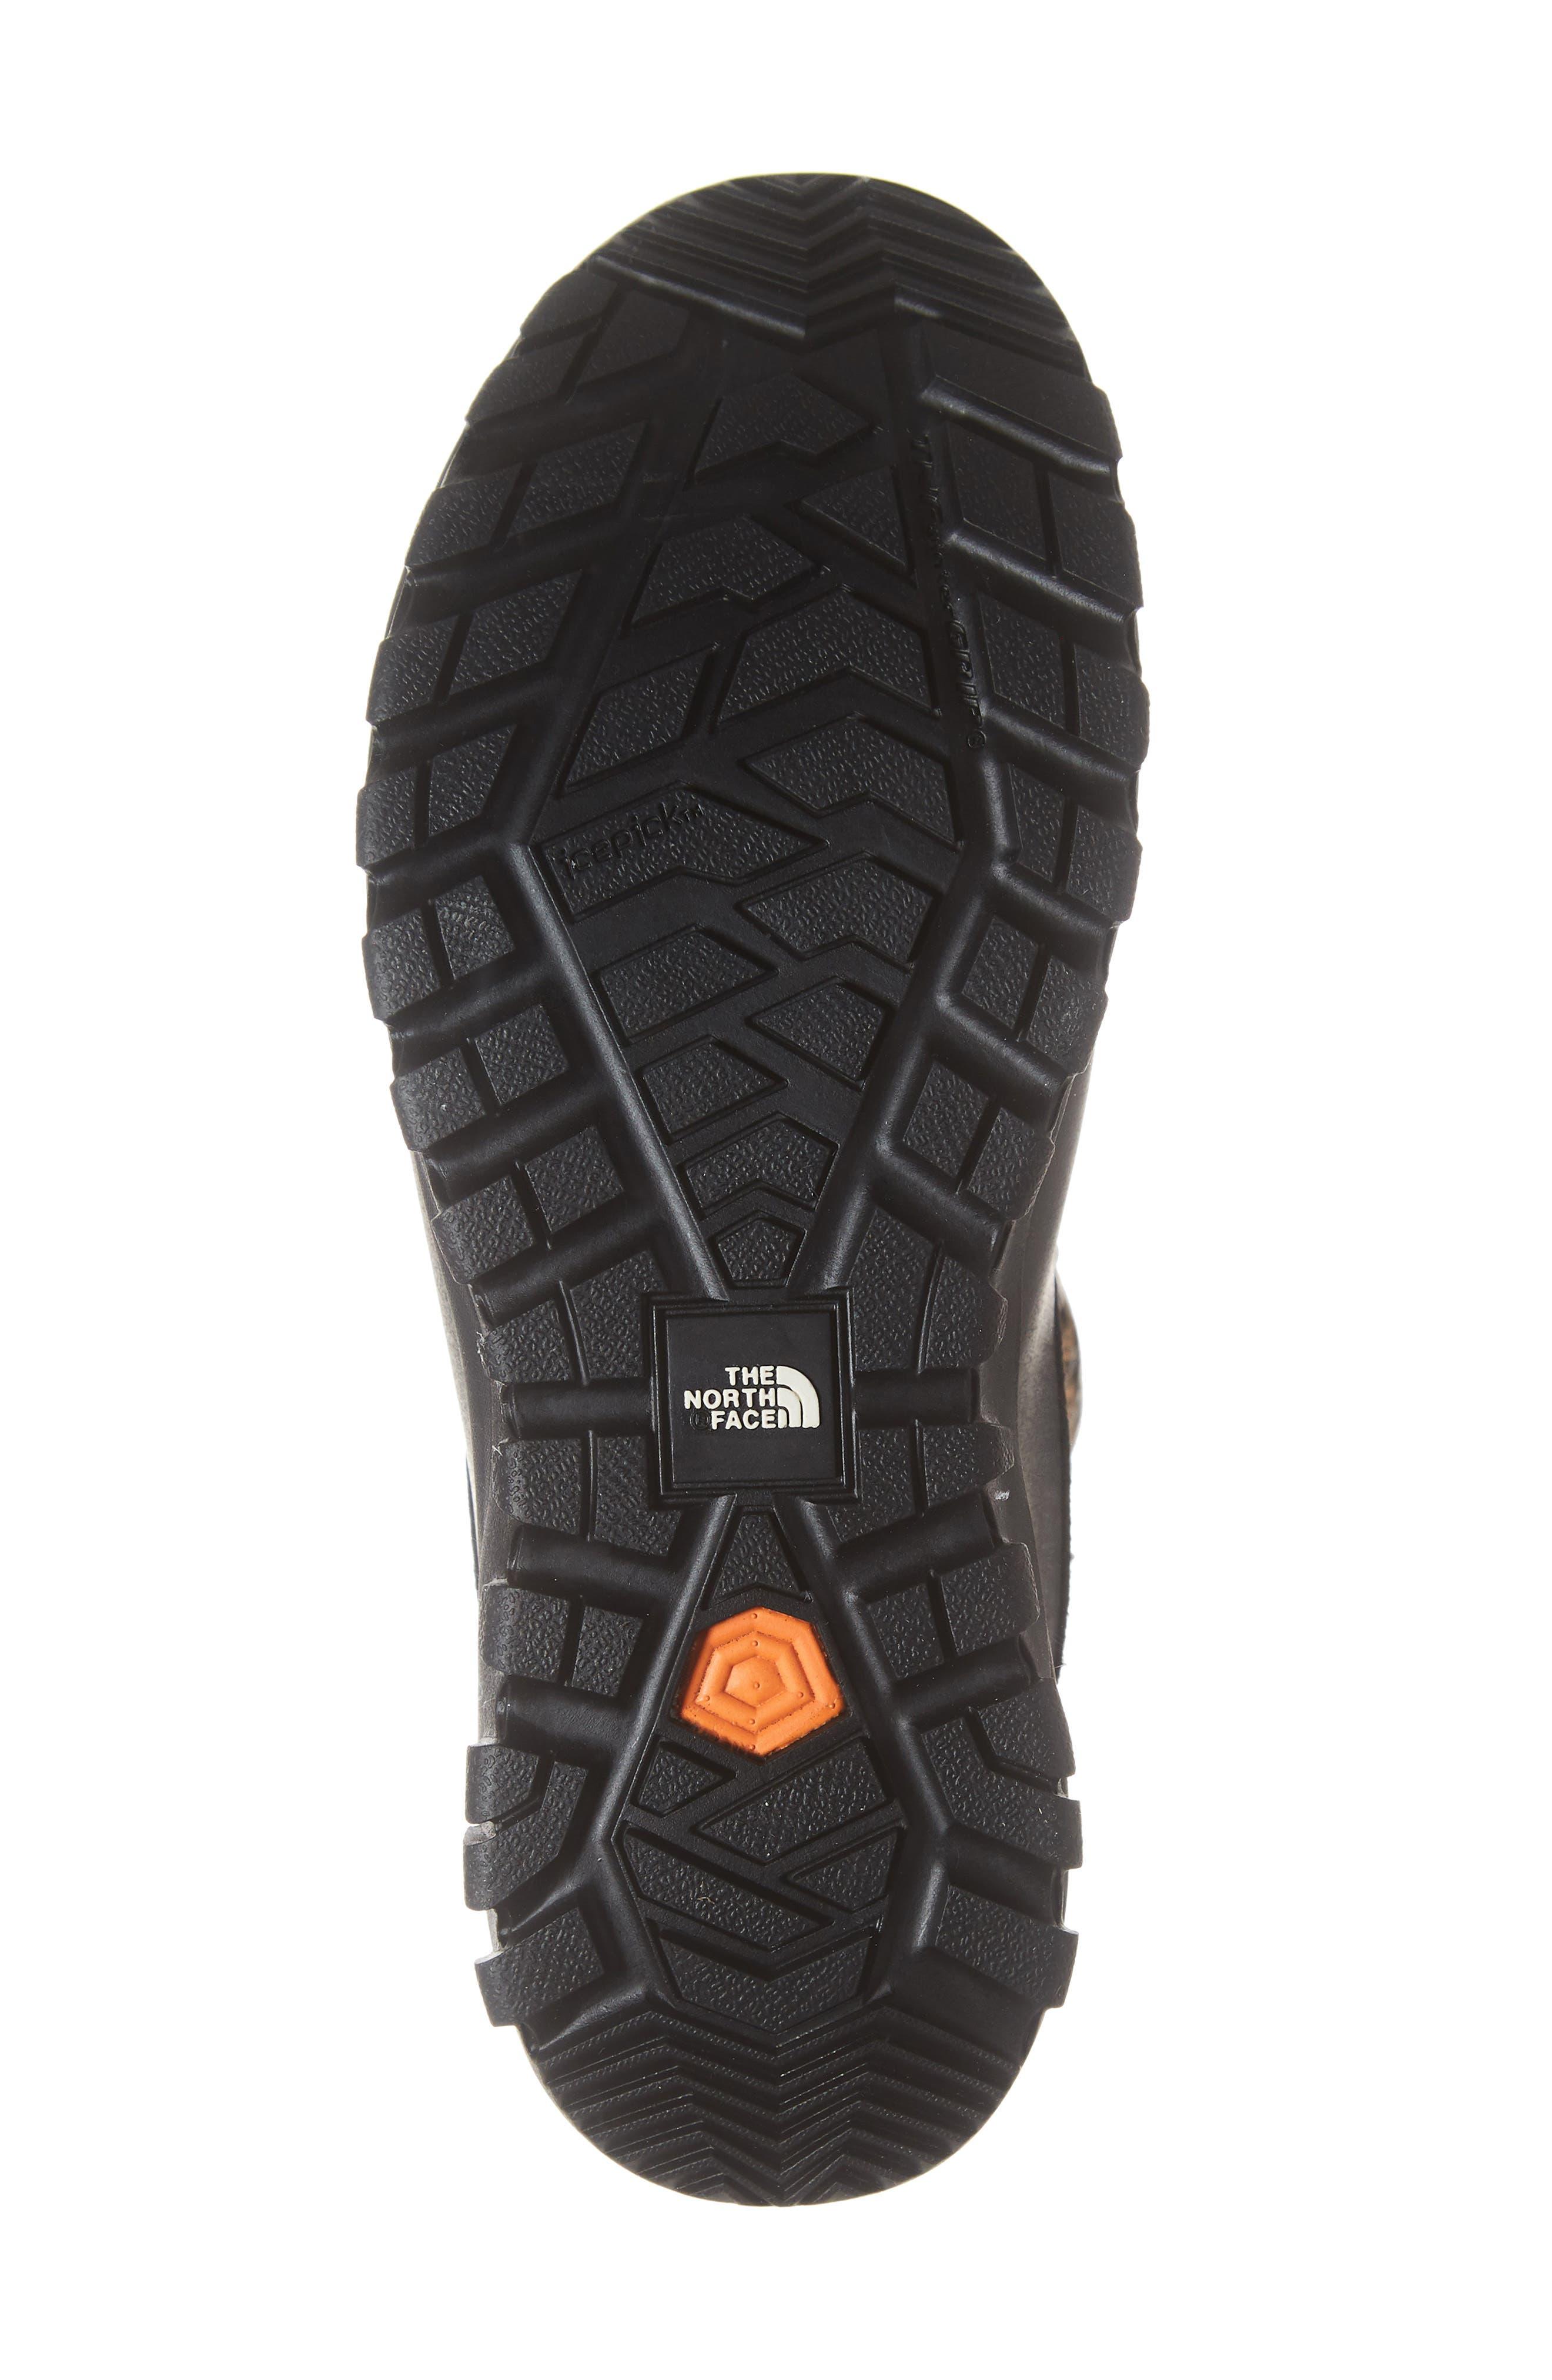 Yukiona Waterproof Ankle Boot,                             Alternate thumbnail 6, color,                             BLACK/ METALLIC COPPER